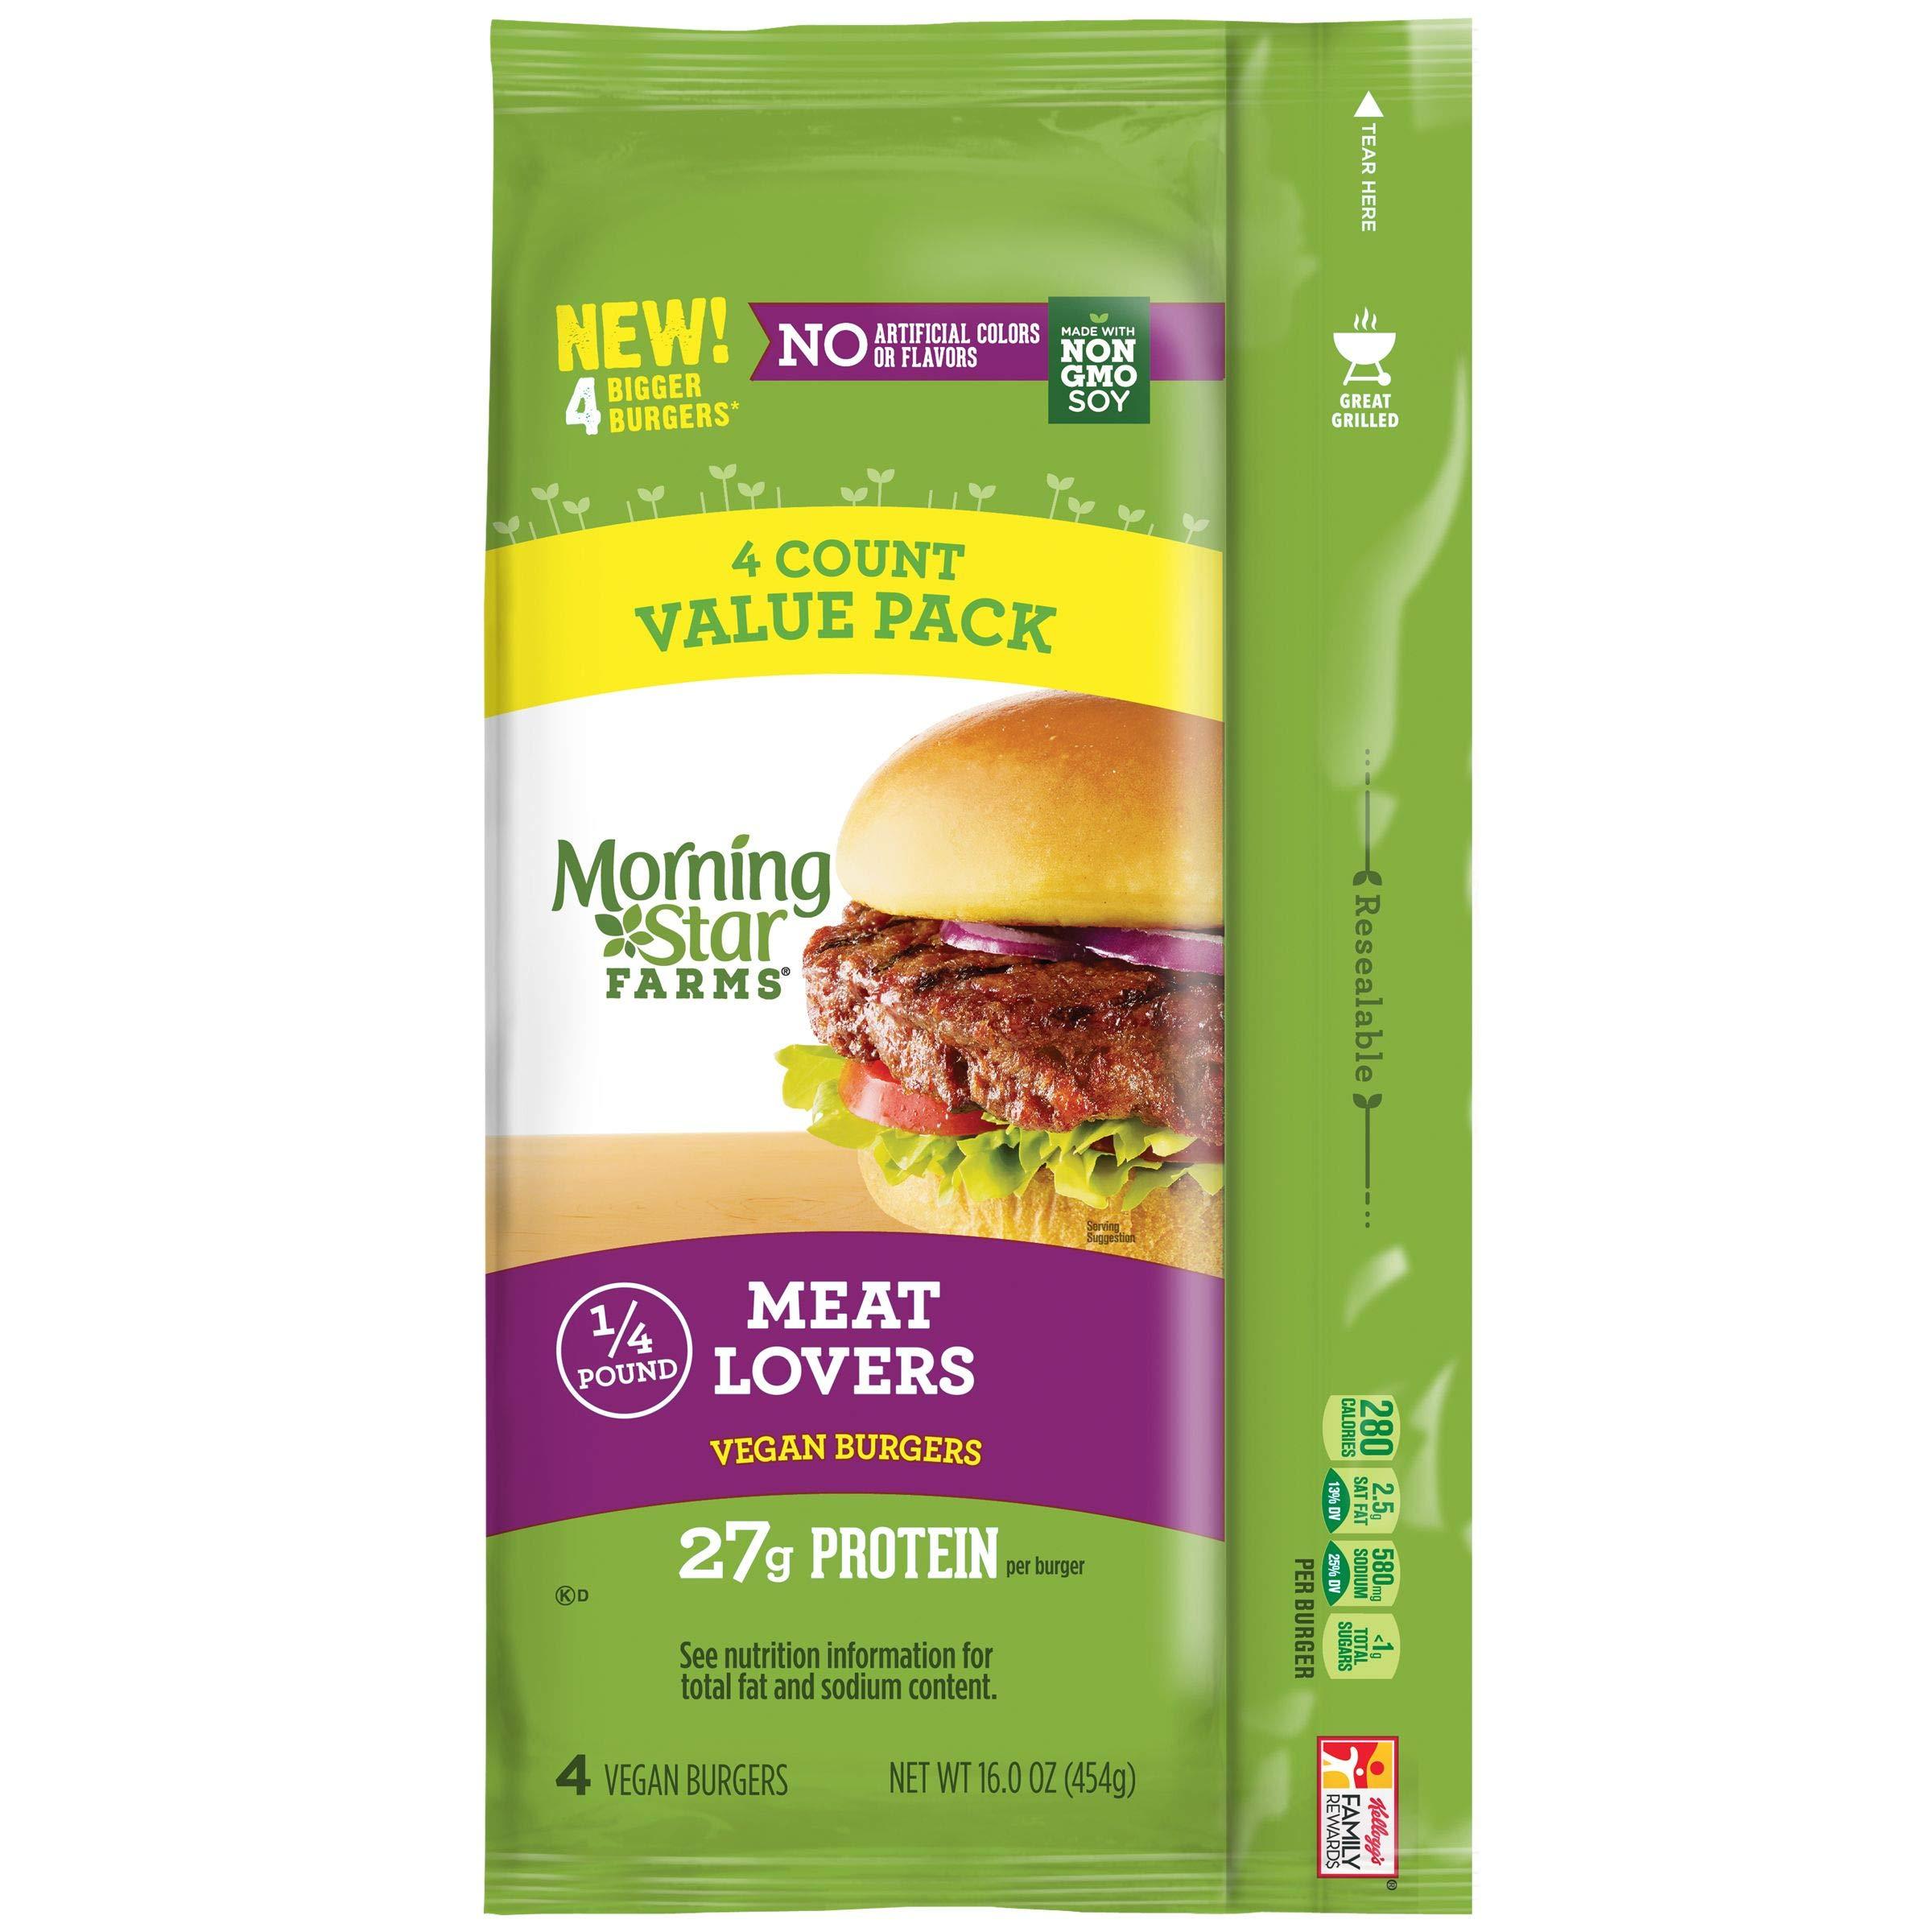 Morningstar Farms Vegan Meat Lovers Veggie Burgers (4 oz Burgers) 16 oz Pack of 6